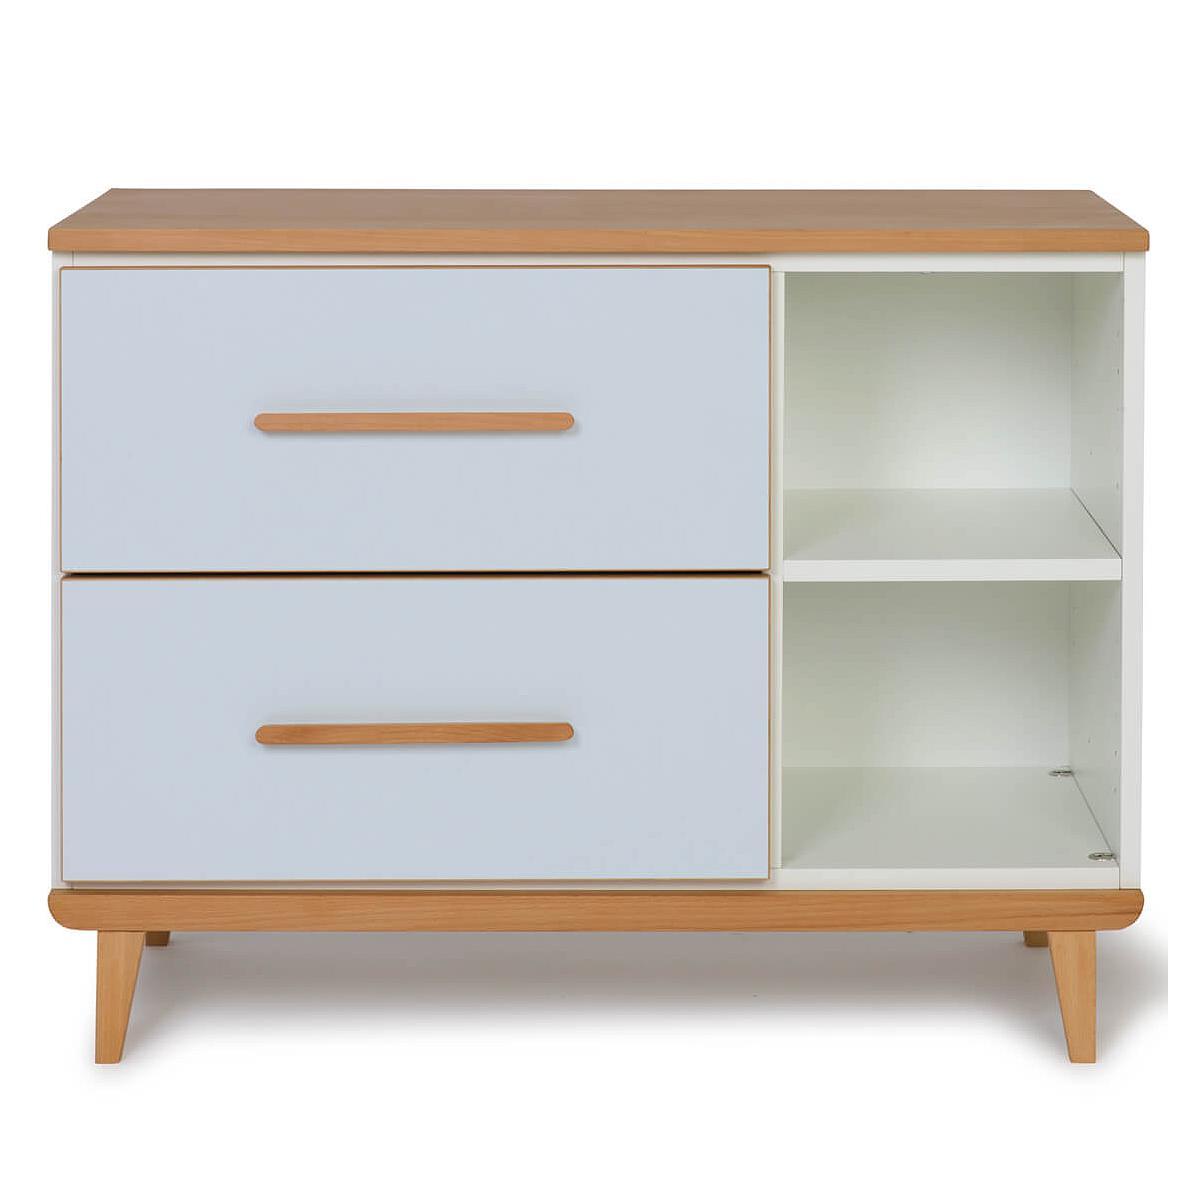 Petit meuble 2 tiroirs NADO By A.K. sky blue